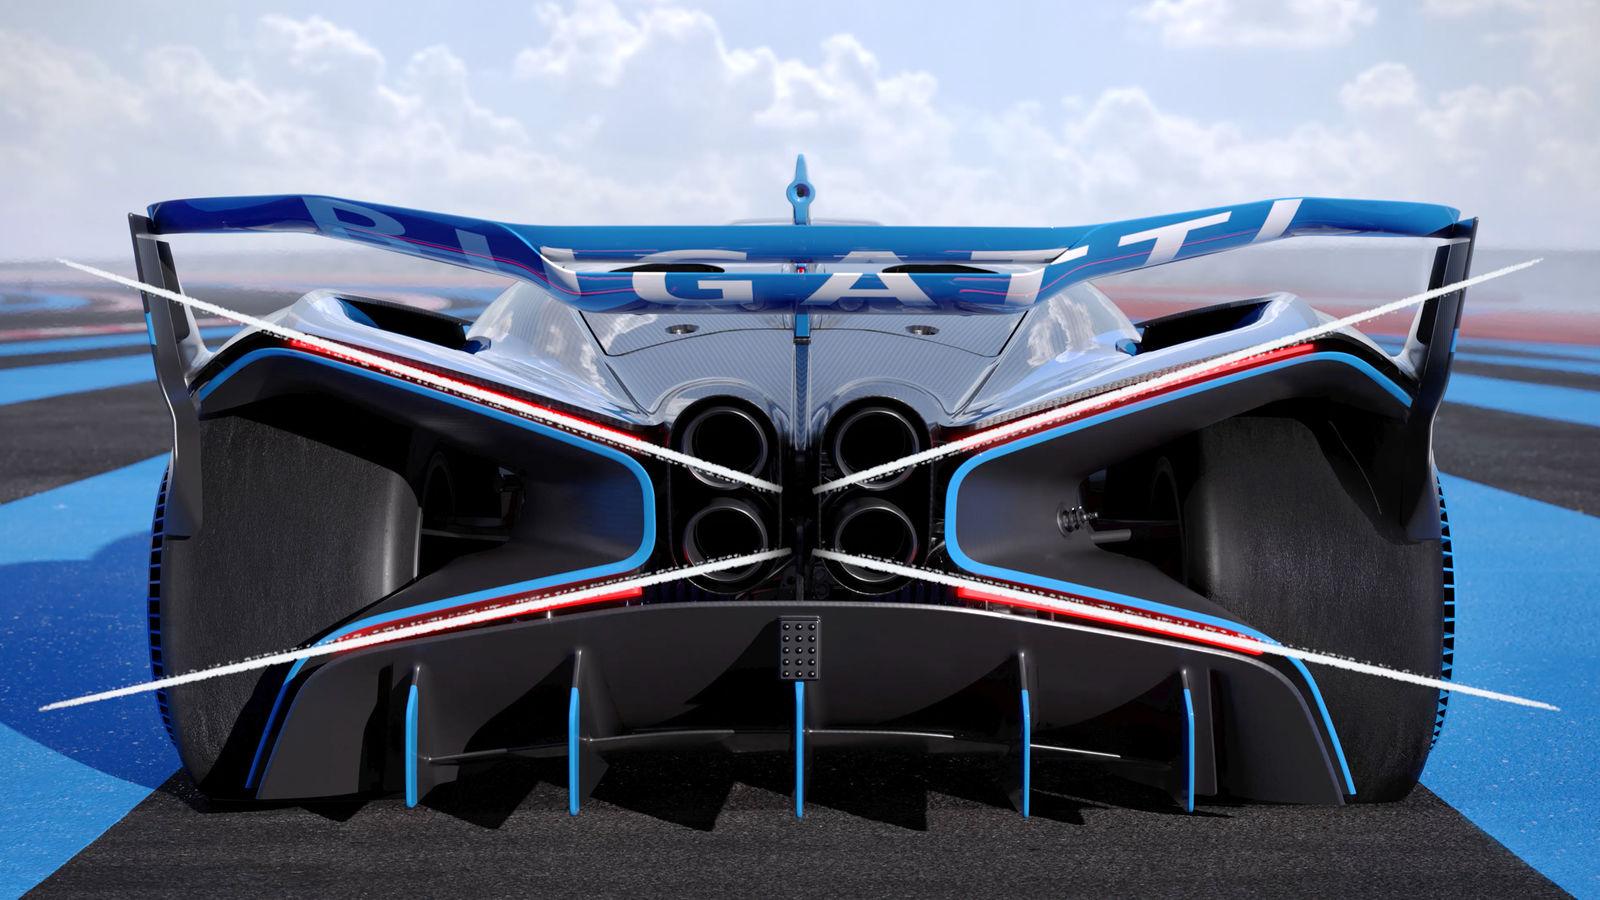 Bugatti-Bolide-concept-photos-31